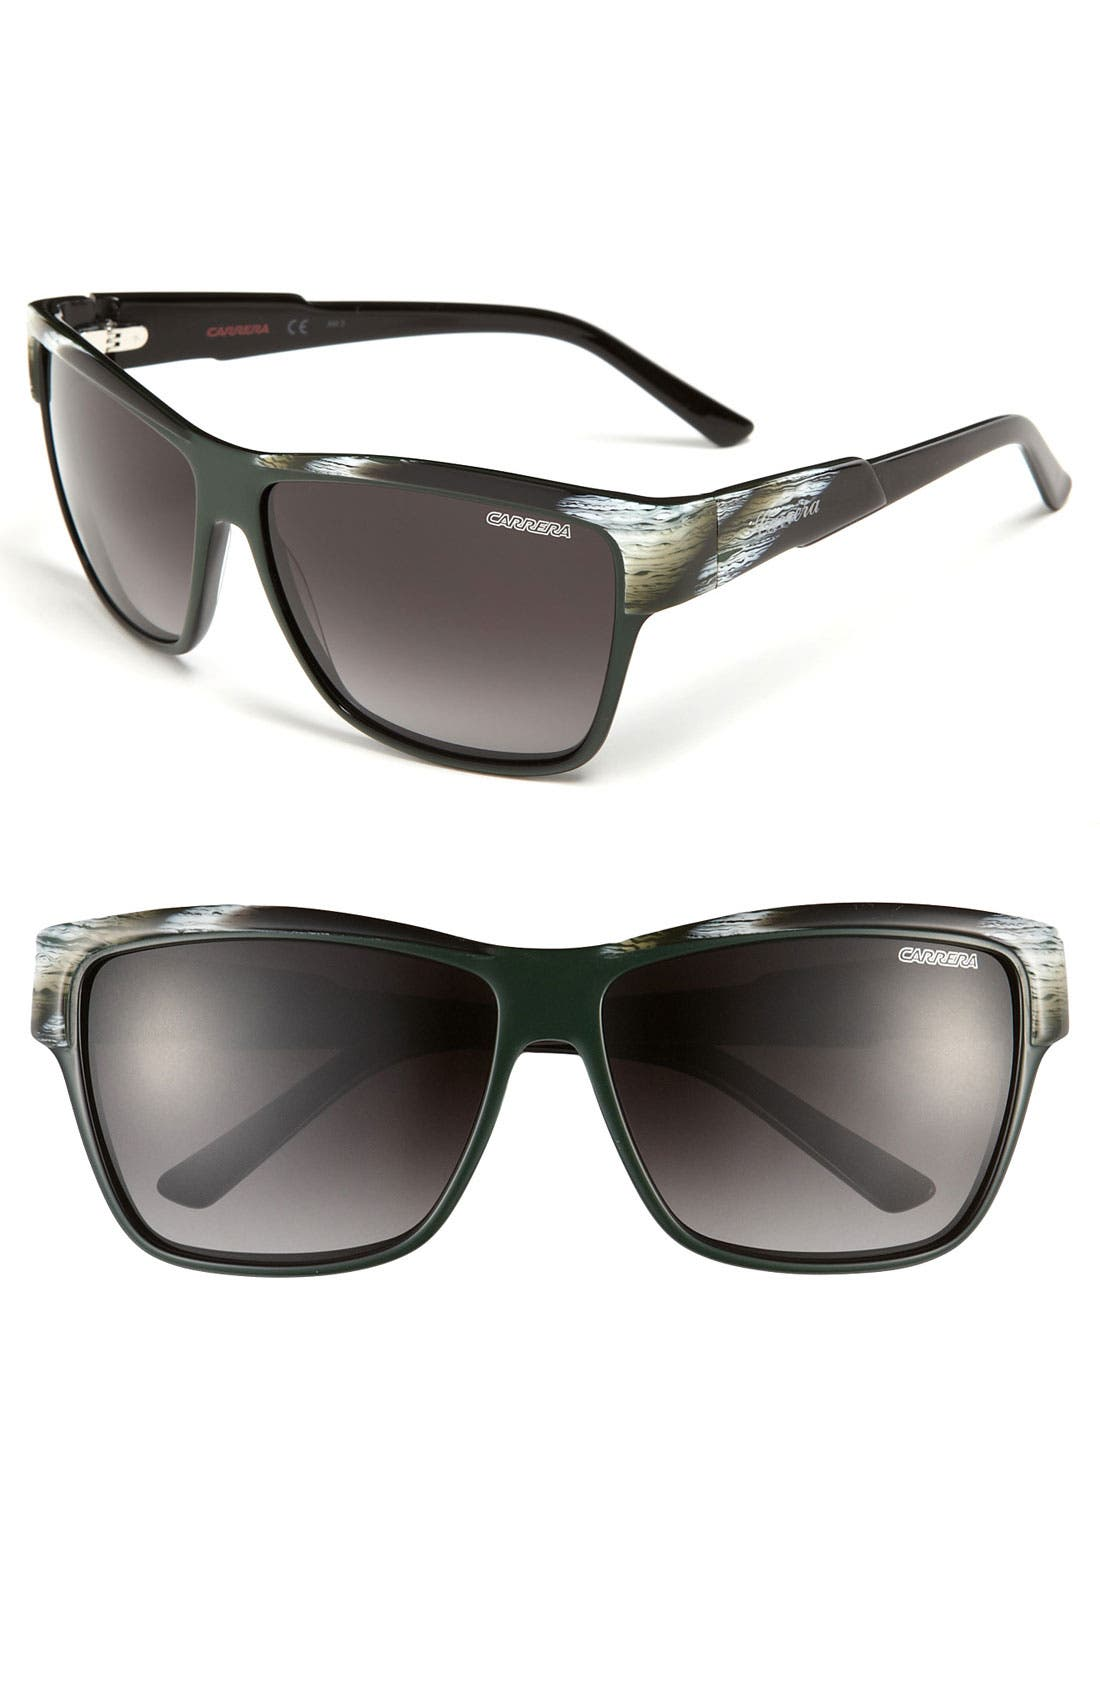 Main Image - Carrera Eyewear 59mm Retro Polarized Sunglasses